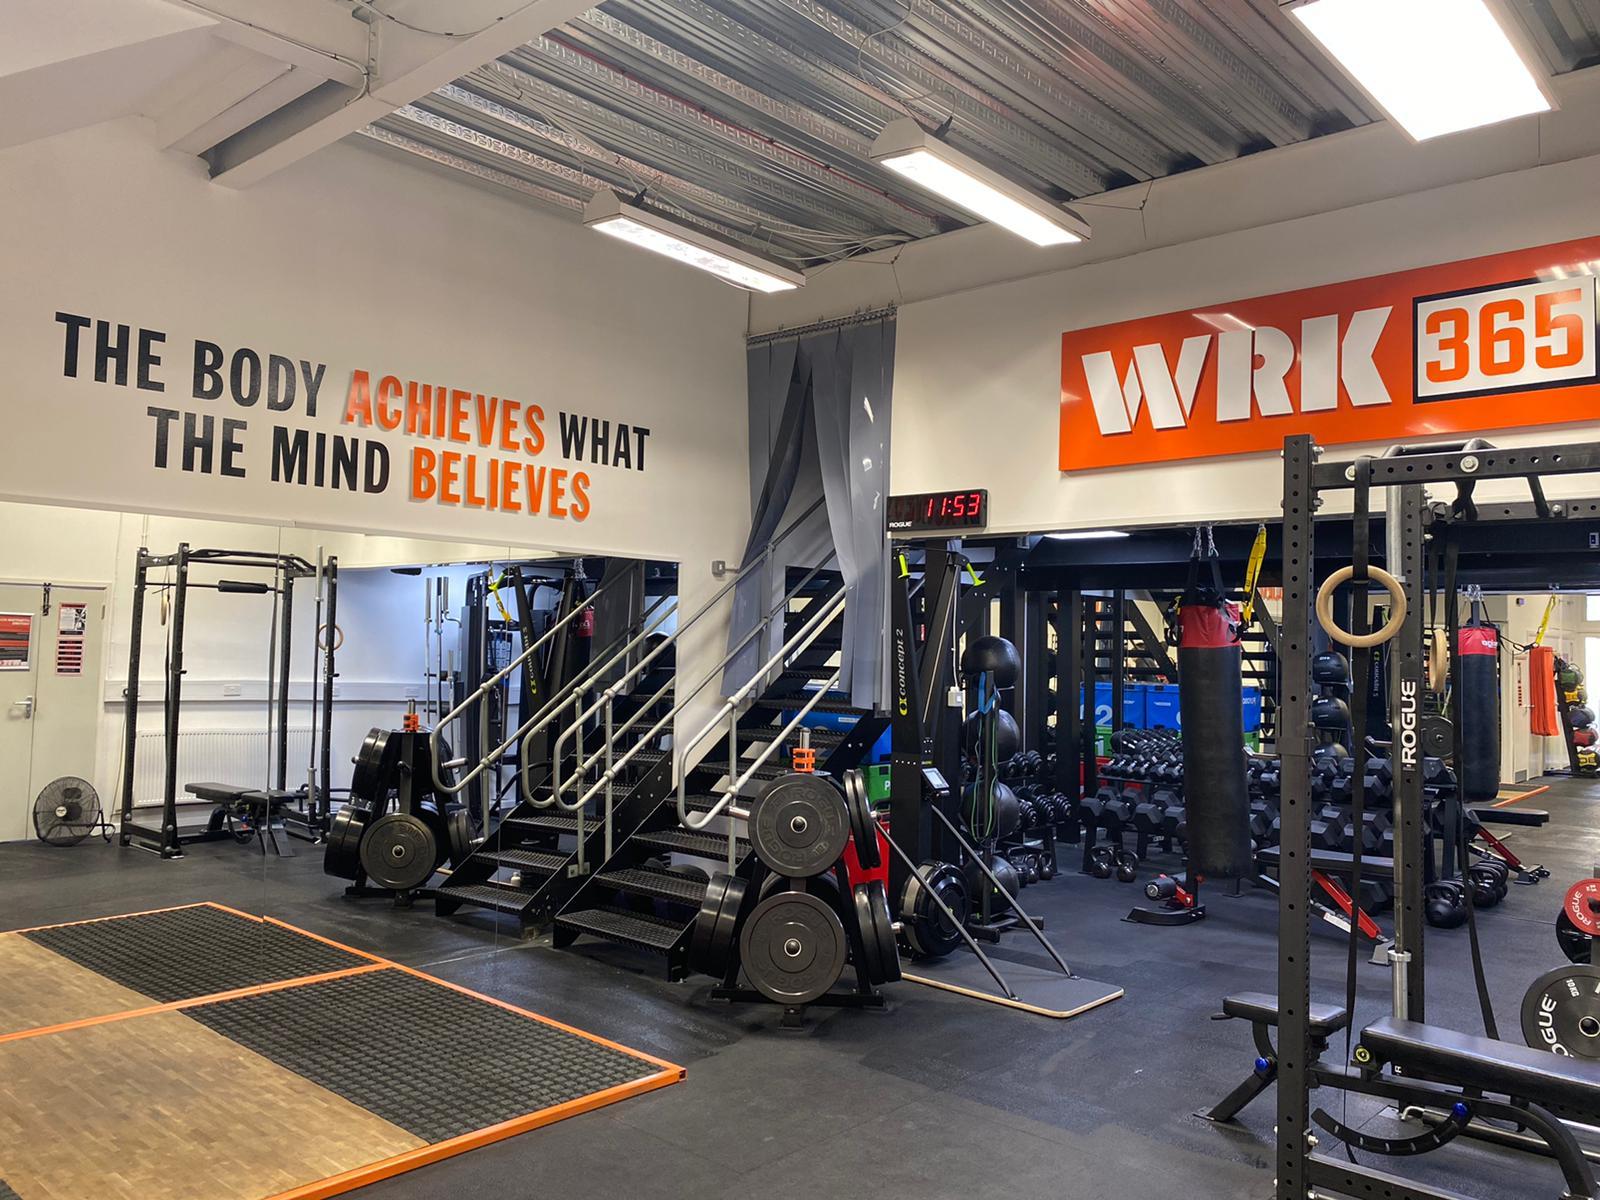 South London Based Gym